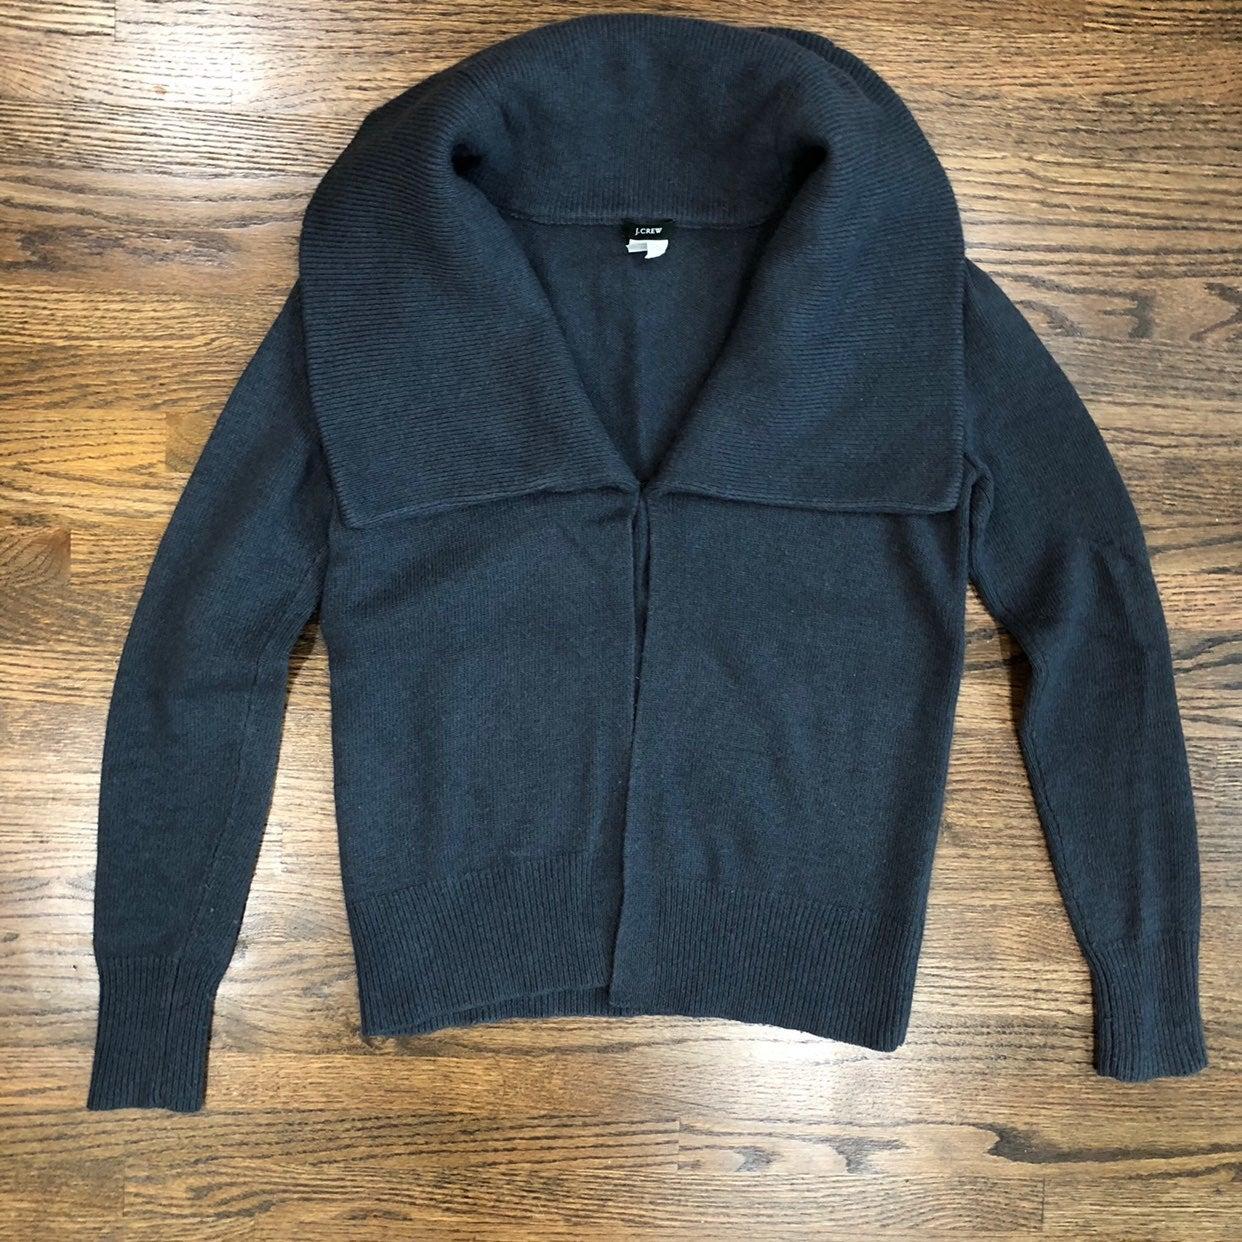 J Crew Wool/Nylon/Cashmere Blend Sweater